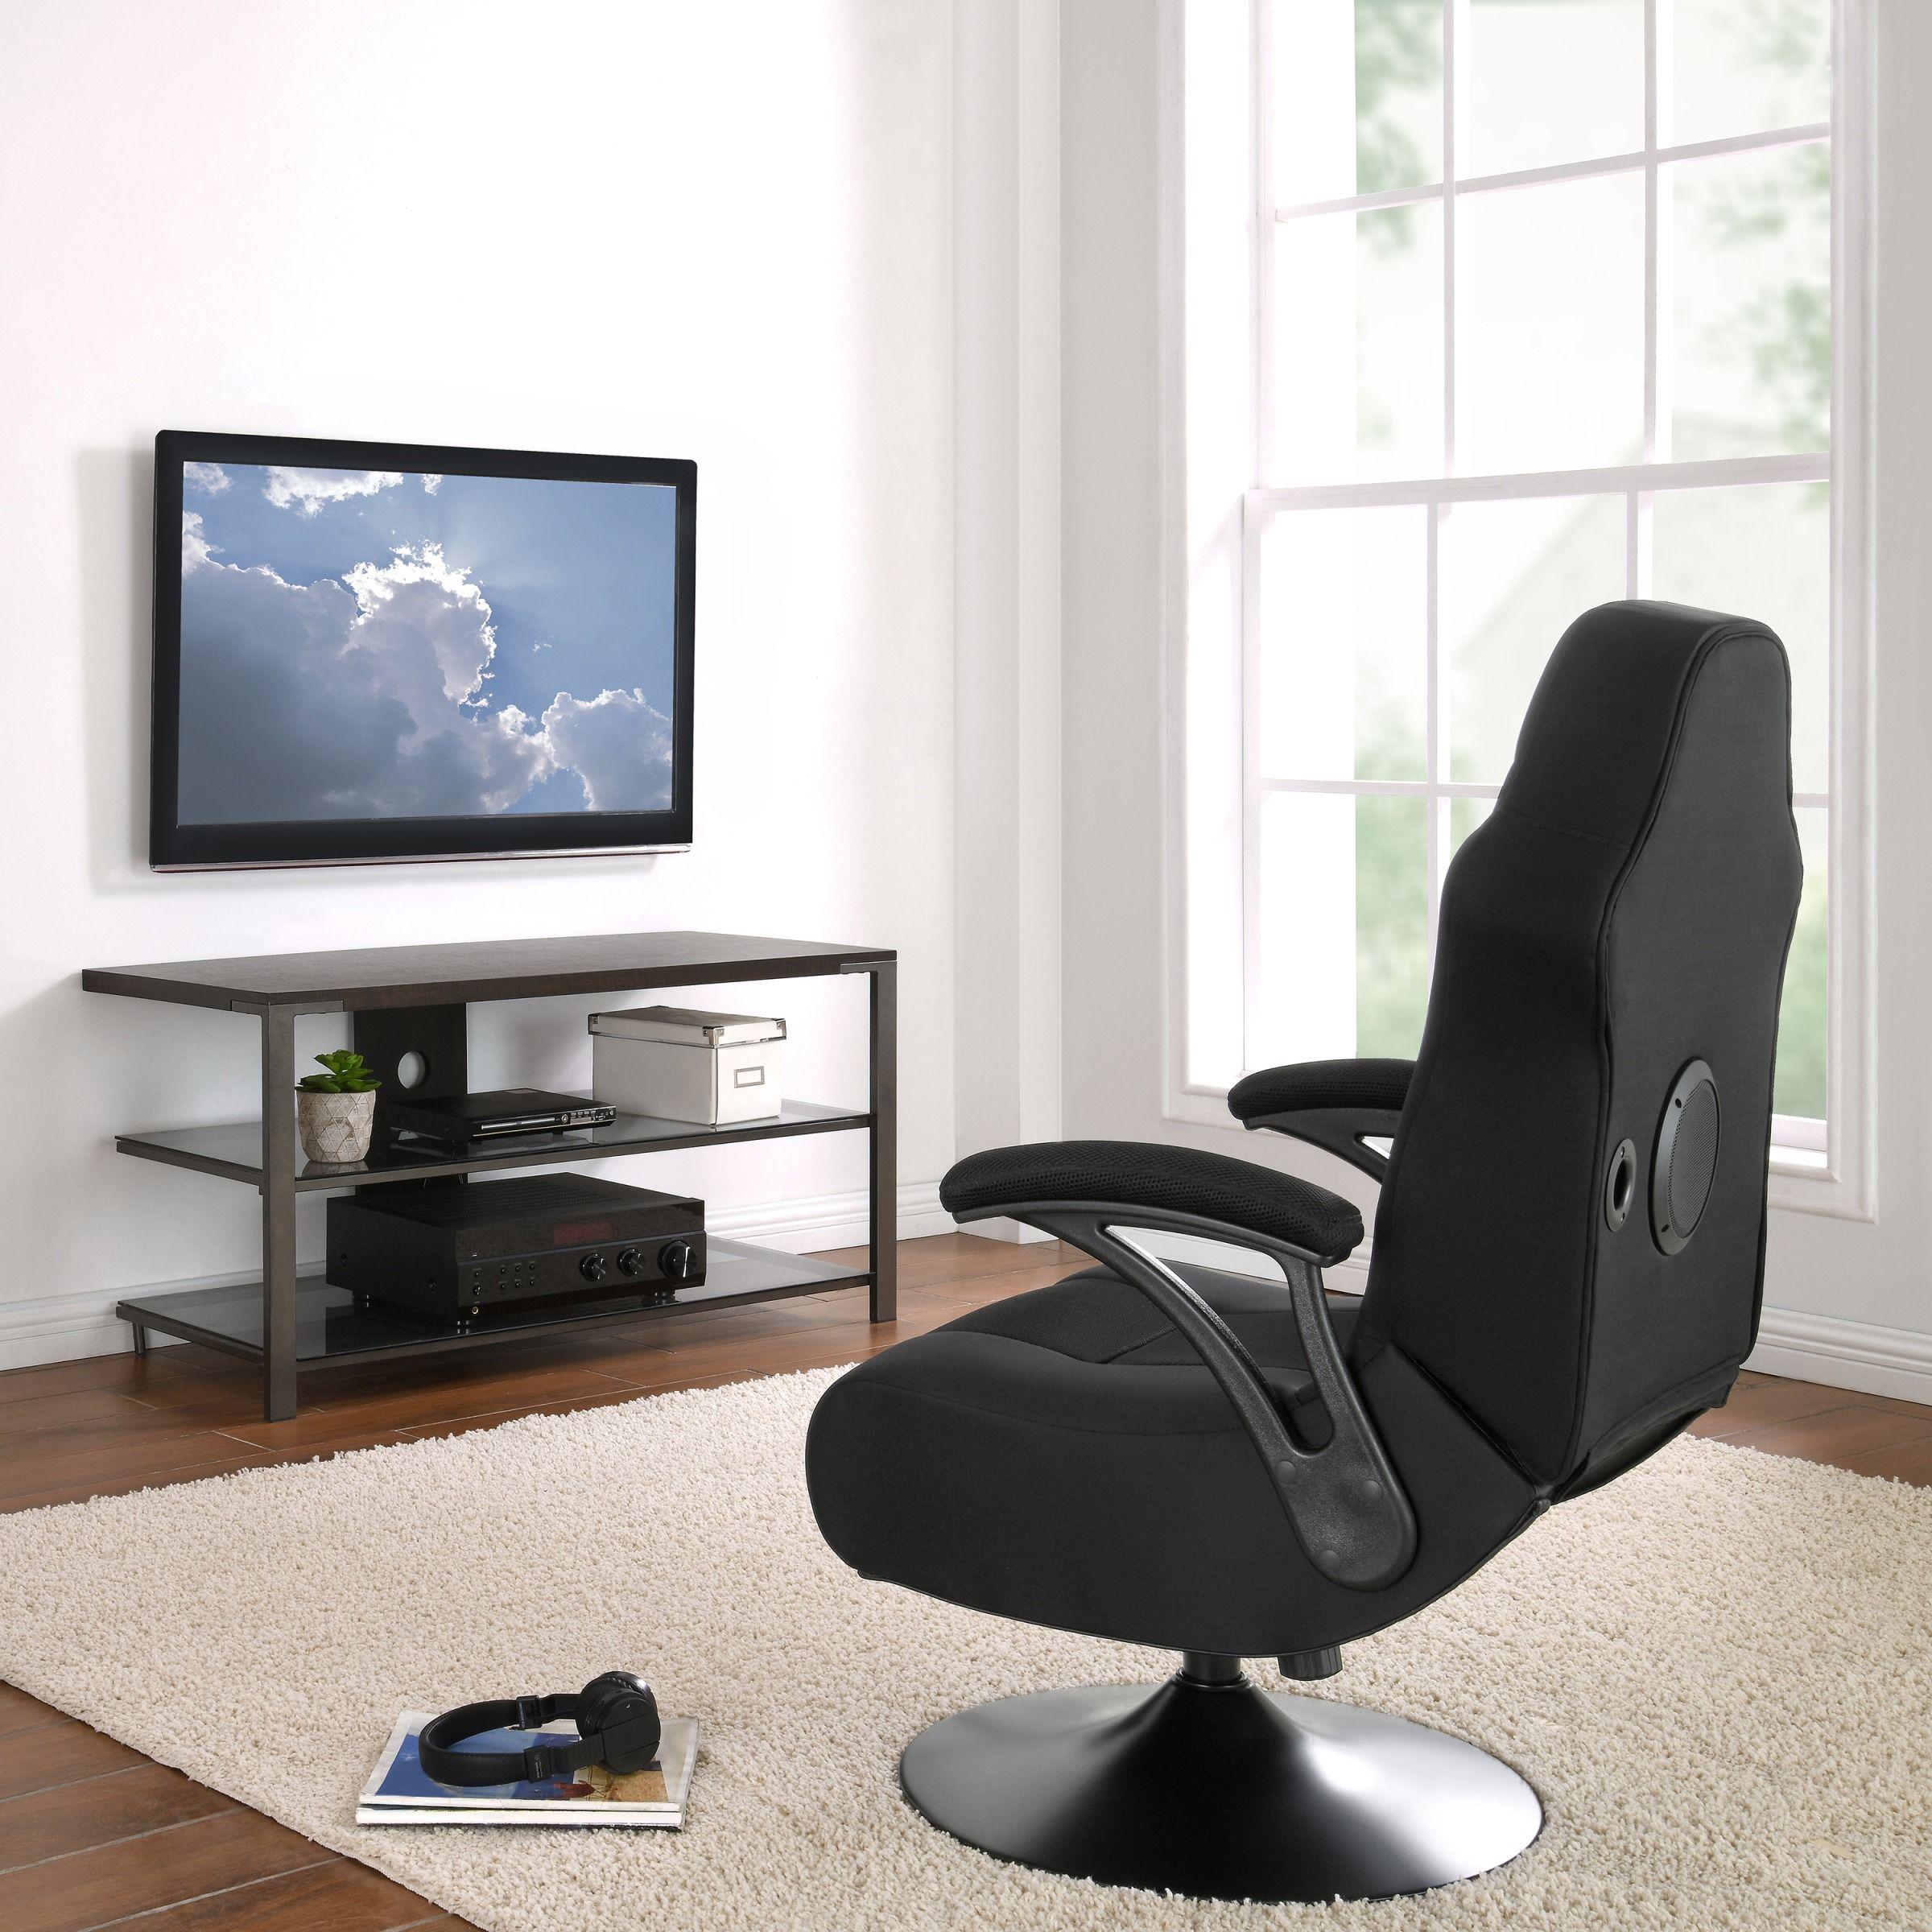 X Rocker XPro 300 Black Pedestal Gaming Chair Rocker with